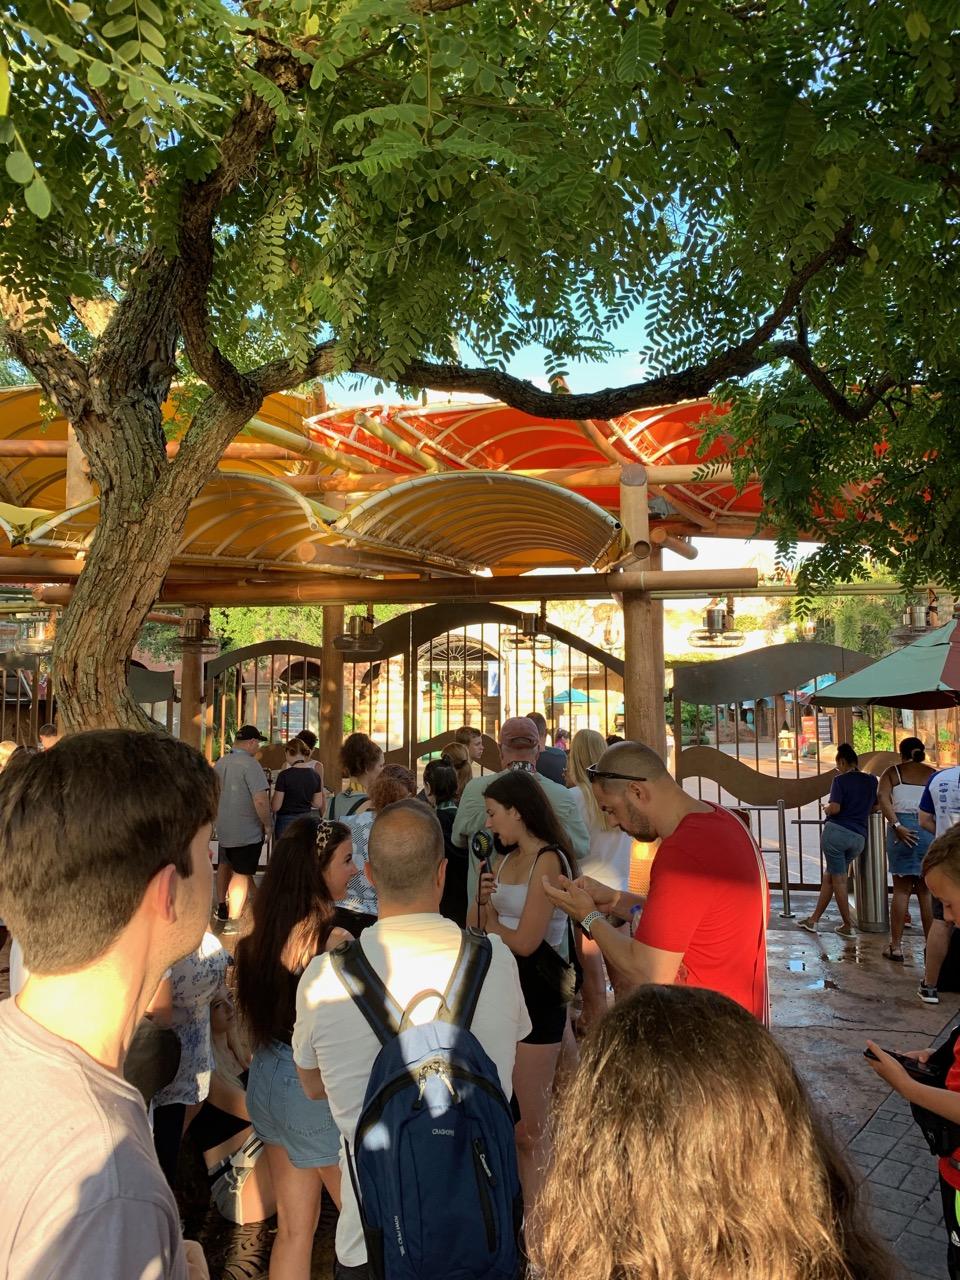 universal orlando summer 2019 trip report part 6 turnstiles.jpeg